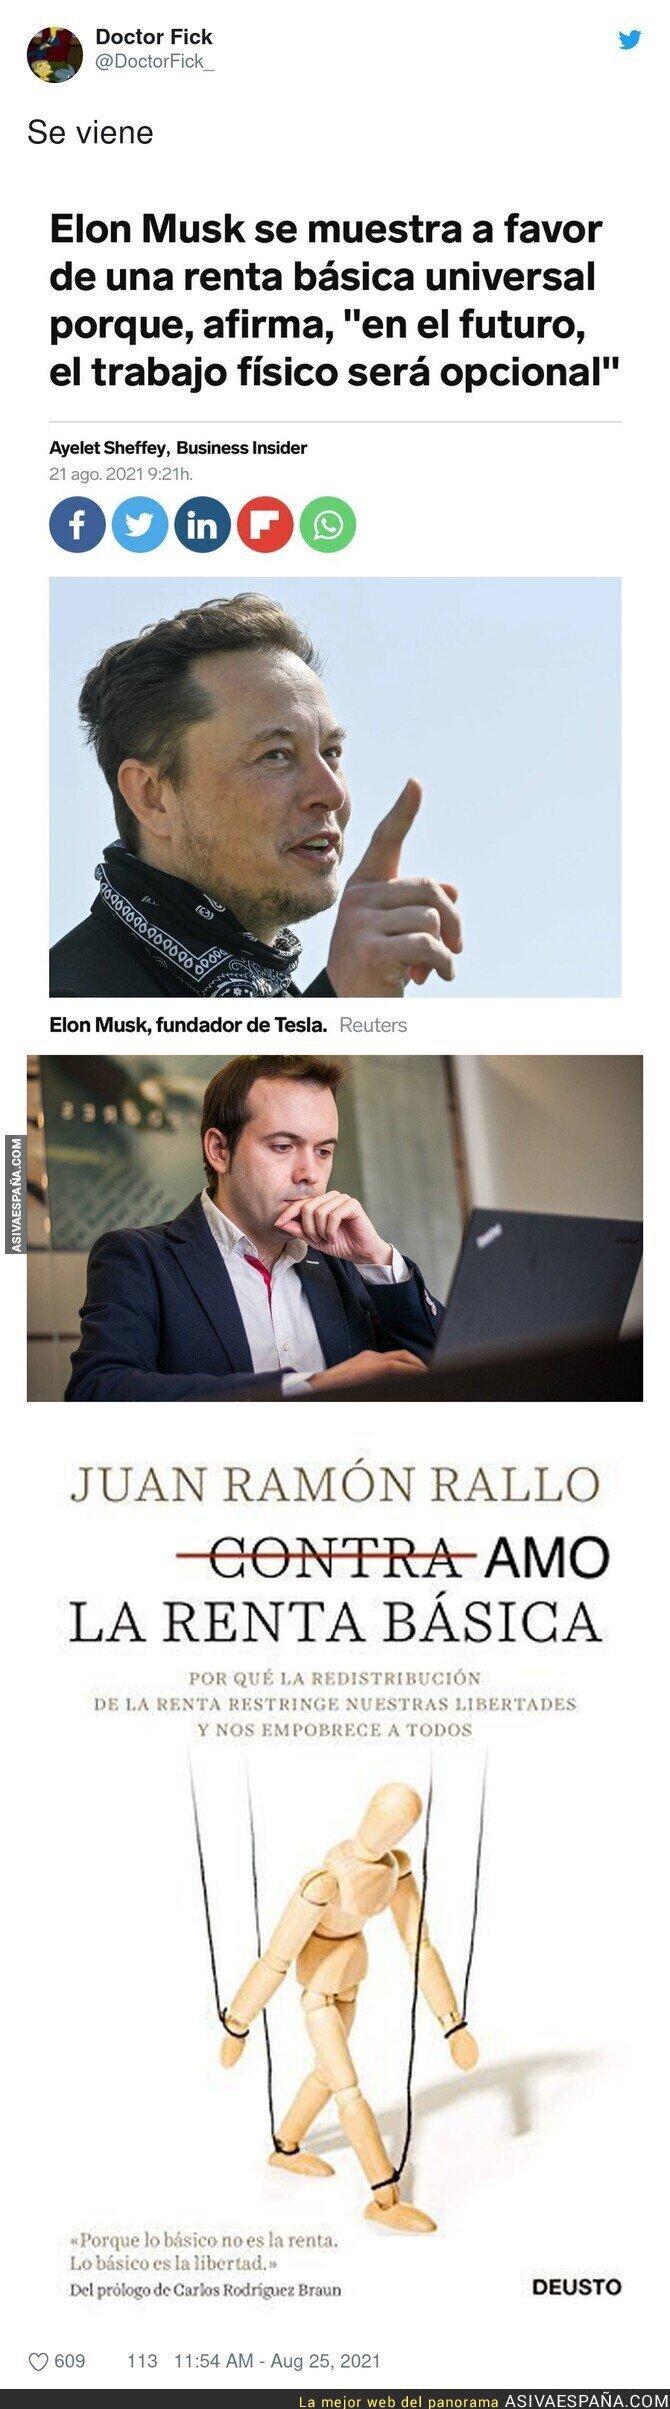 885211 - El drama de Juan Ramón Rallo